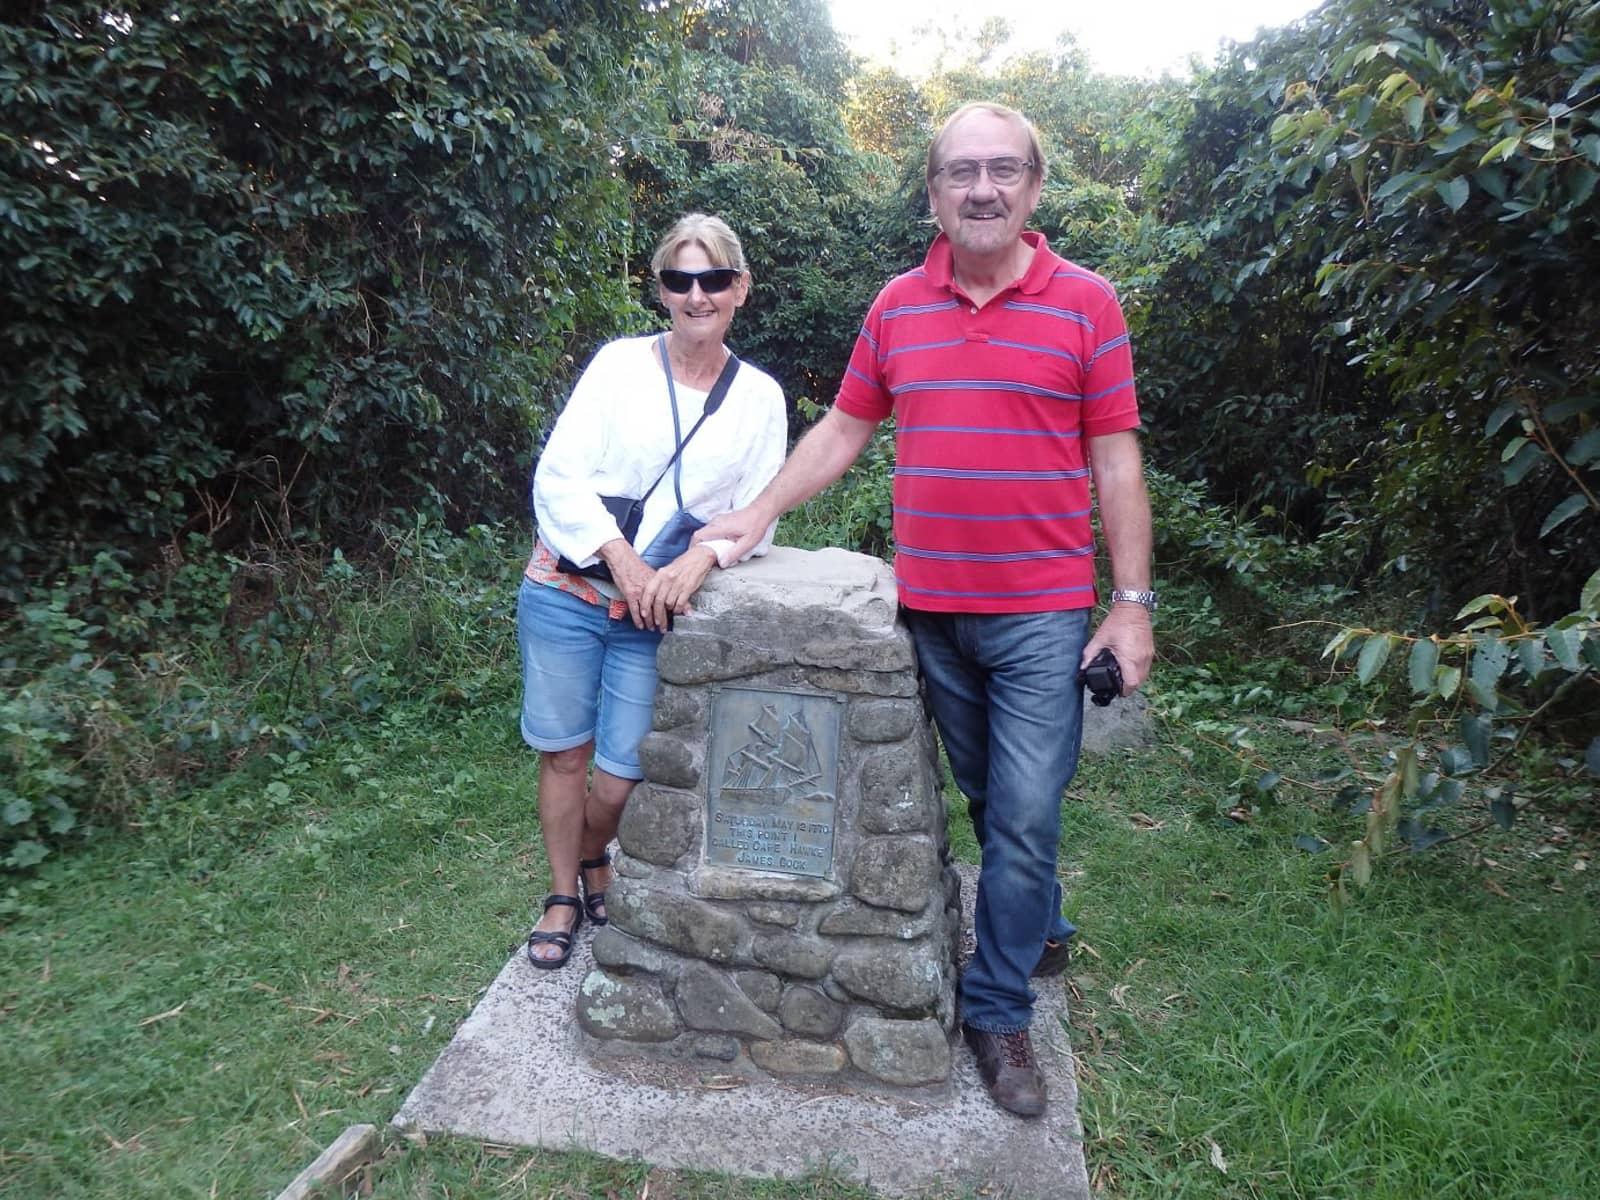 Paul michael & Lorraine joy from Mount Eliza, Victoria, Australia